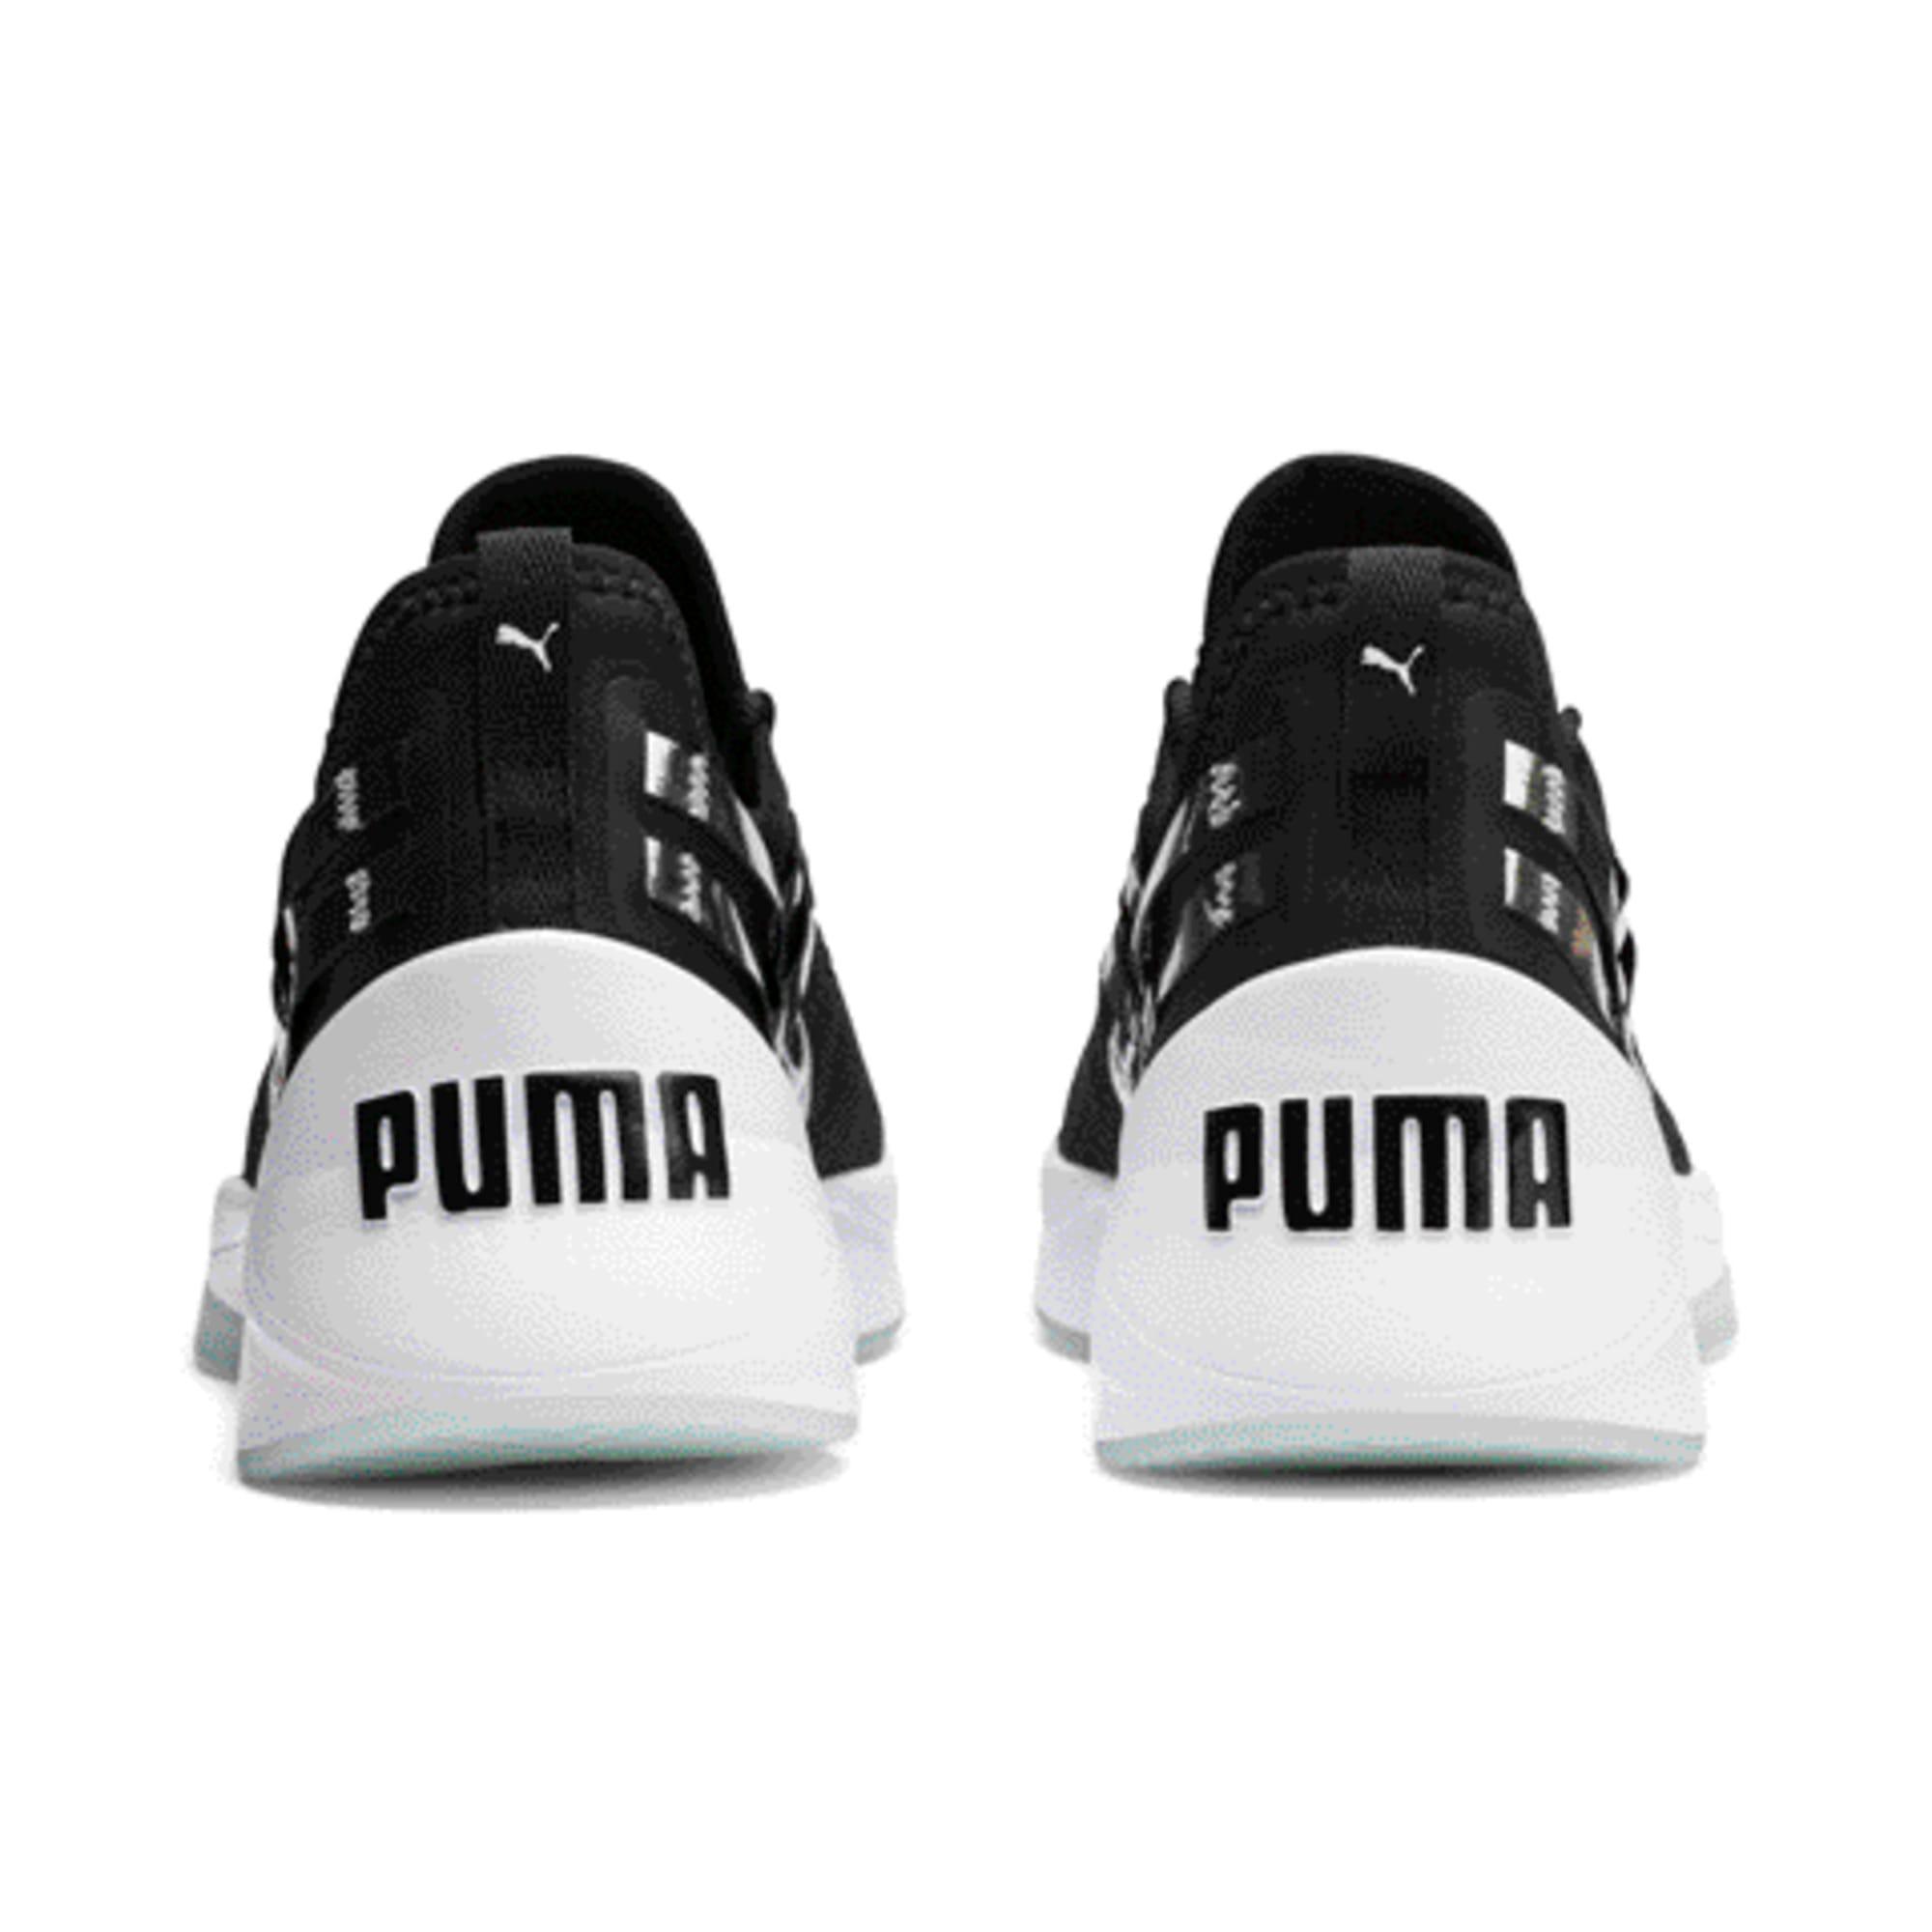 Thumbnail 3 of Jaab XT Trailblazer Women's Training Shoes, Puma Black-Fair Aqua, medium